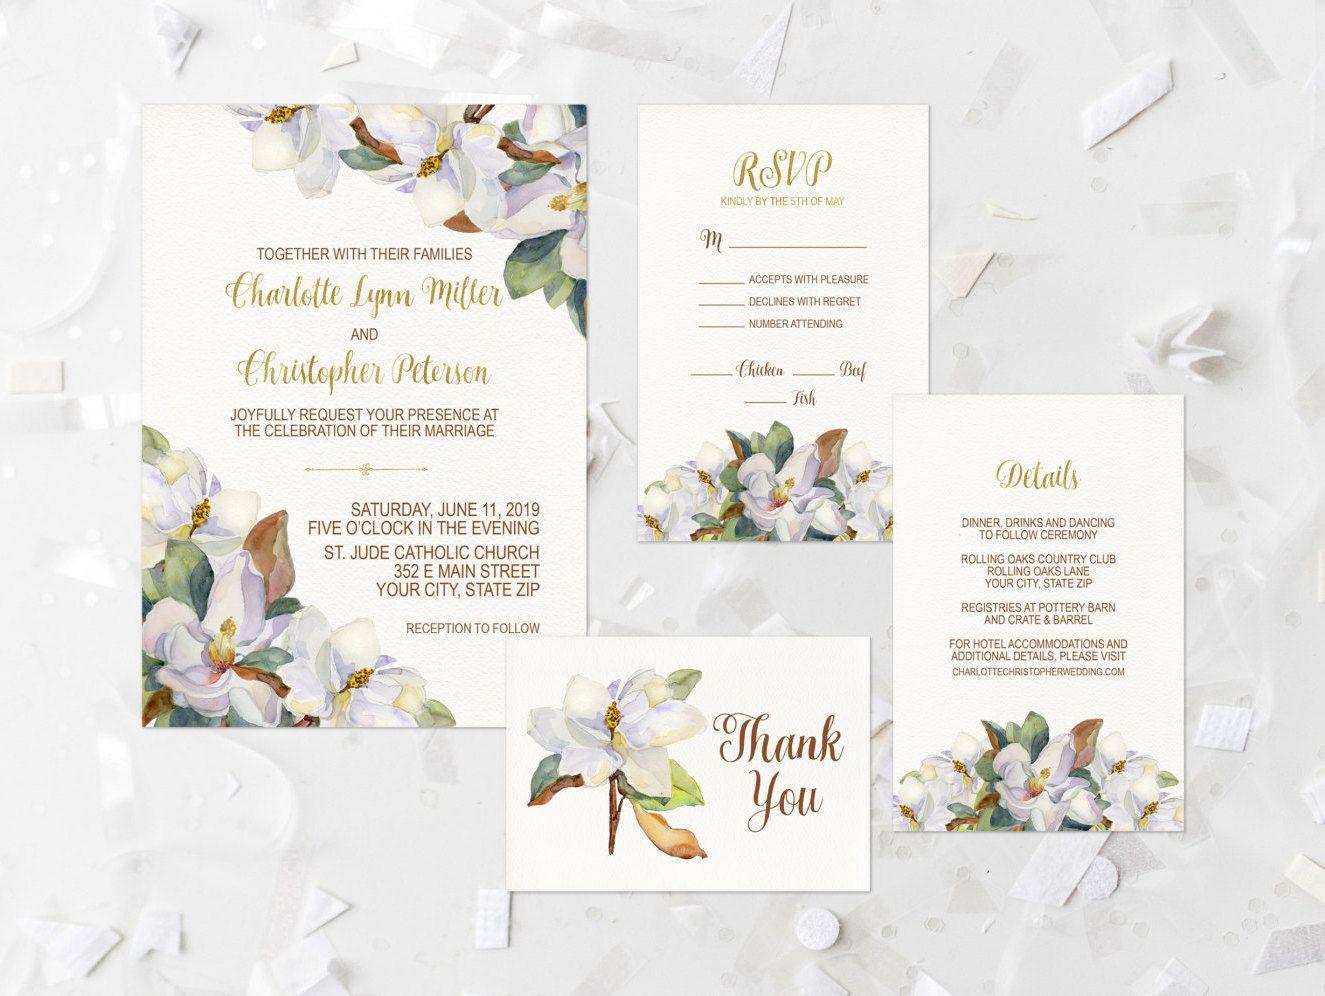 Wedding Invitation Suite Printable Magnolia Floral Wedding Invite Whit Magnolia Wedding Invitations Etsy Wedding Invitations Wedding Invitation Suite Printable